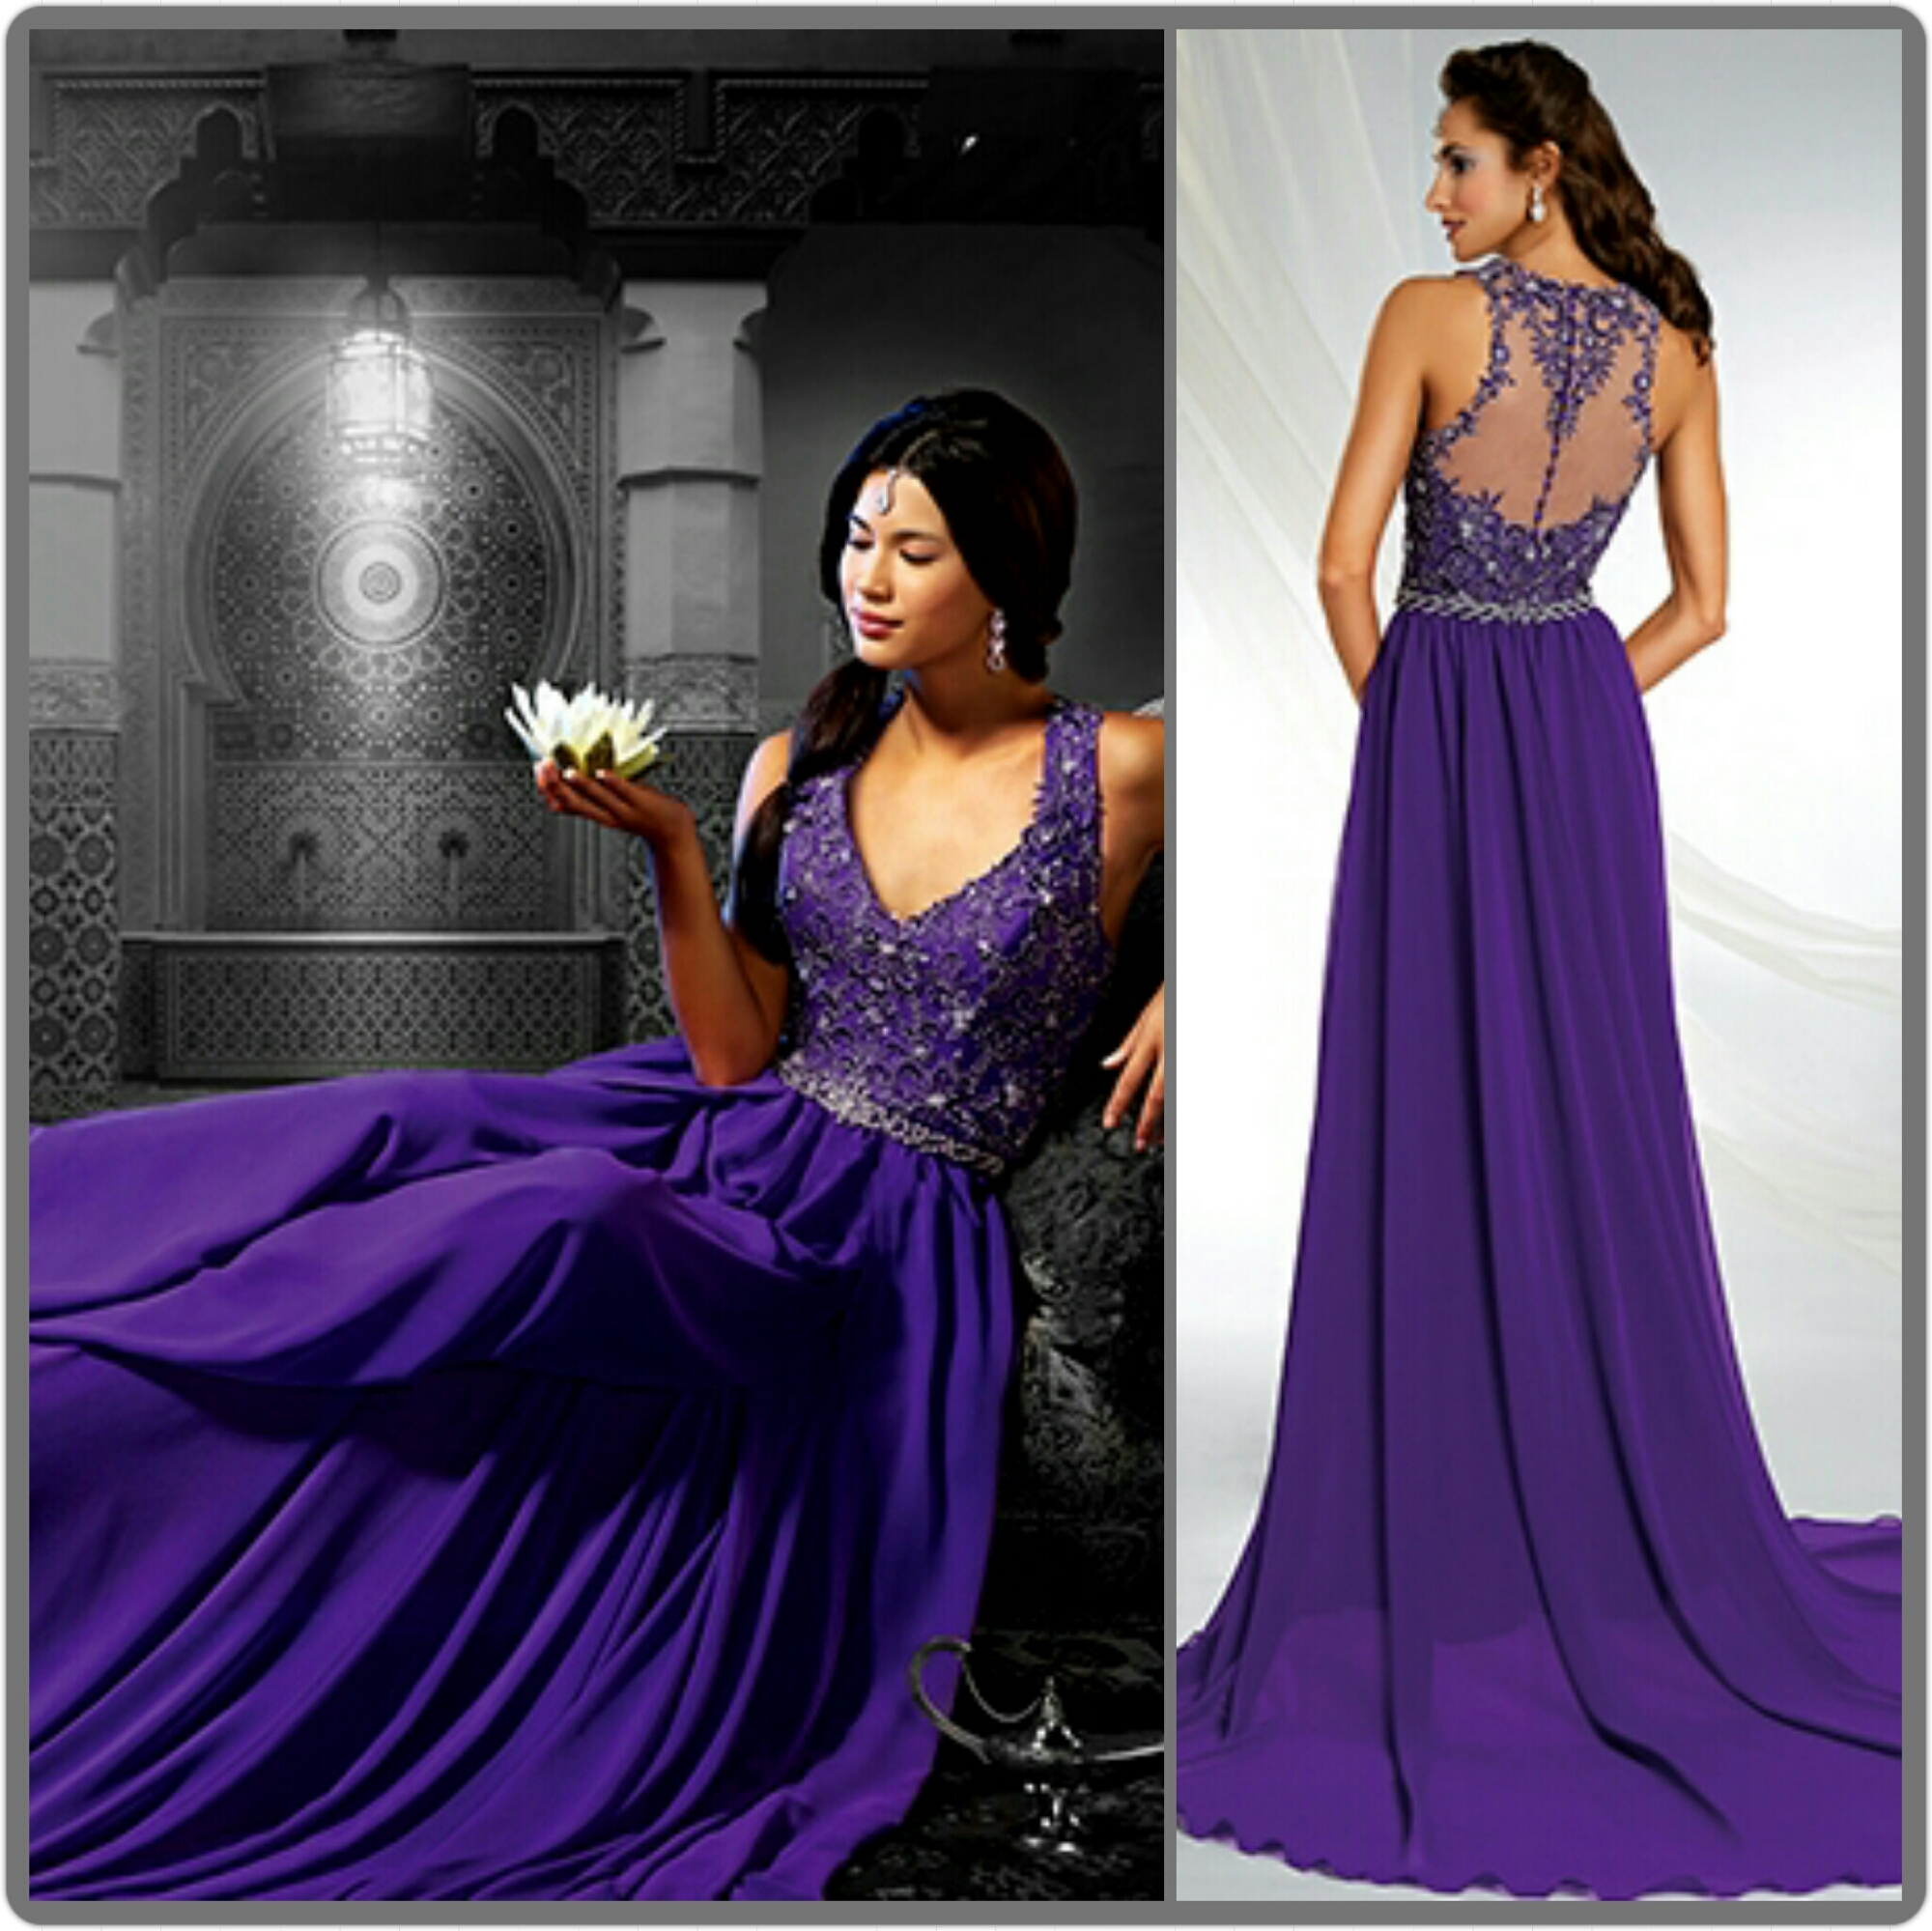 Amusing This Beauty Purple Tagweddings A Ballgown Will Definitely Be Wedding Gowns Black Velvet Bodice Purple Satin Ballgown Wedding Dress Shades wedding dress Purple Wedding Dresses